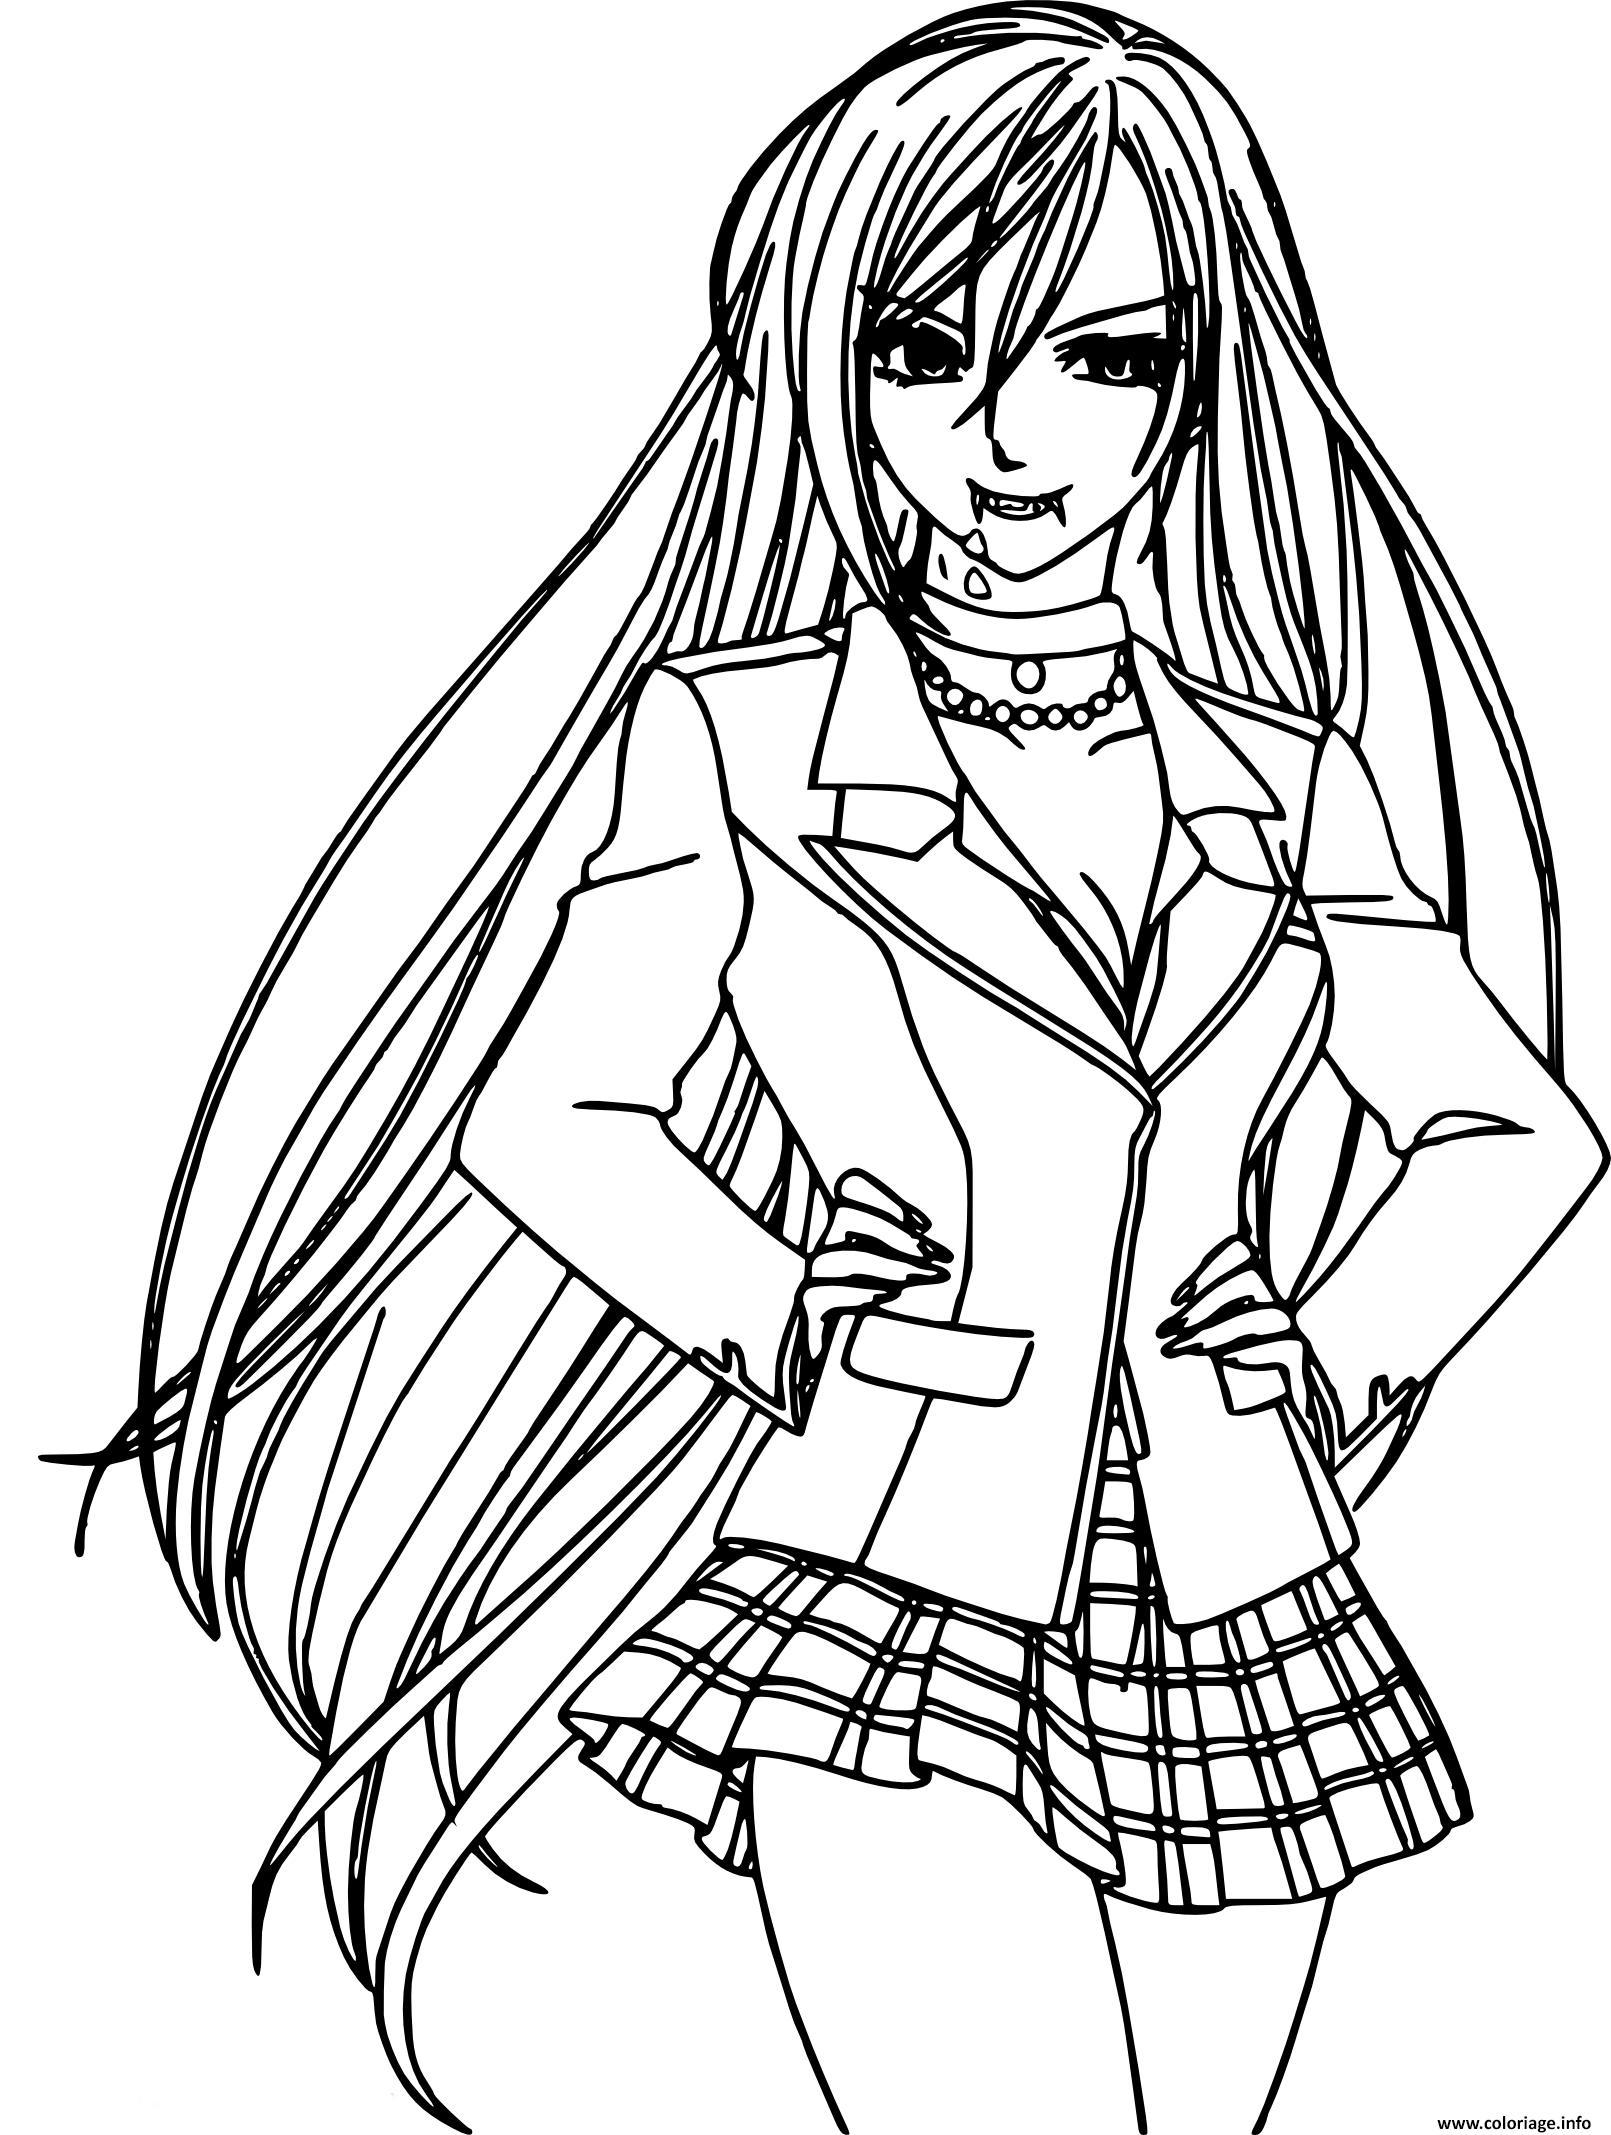 Dessin fille vampire manga Coloriage Gratuit à Imprimer